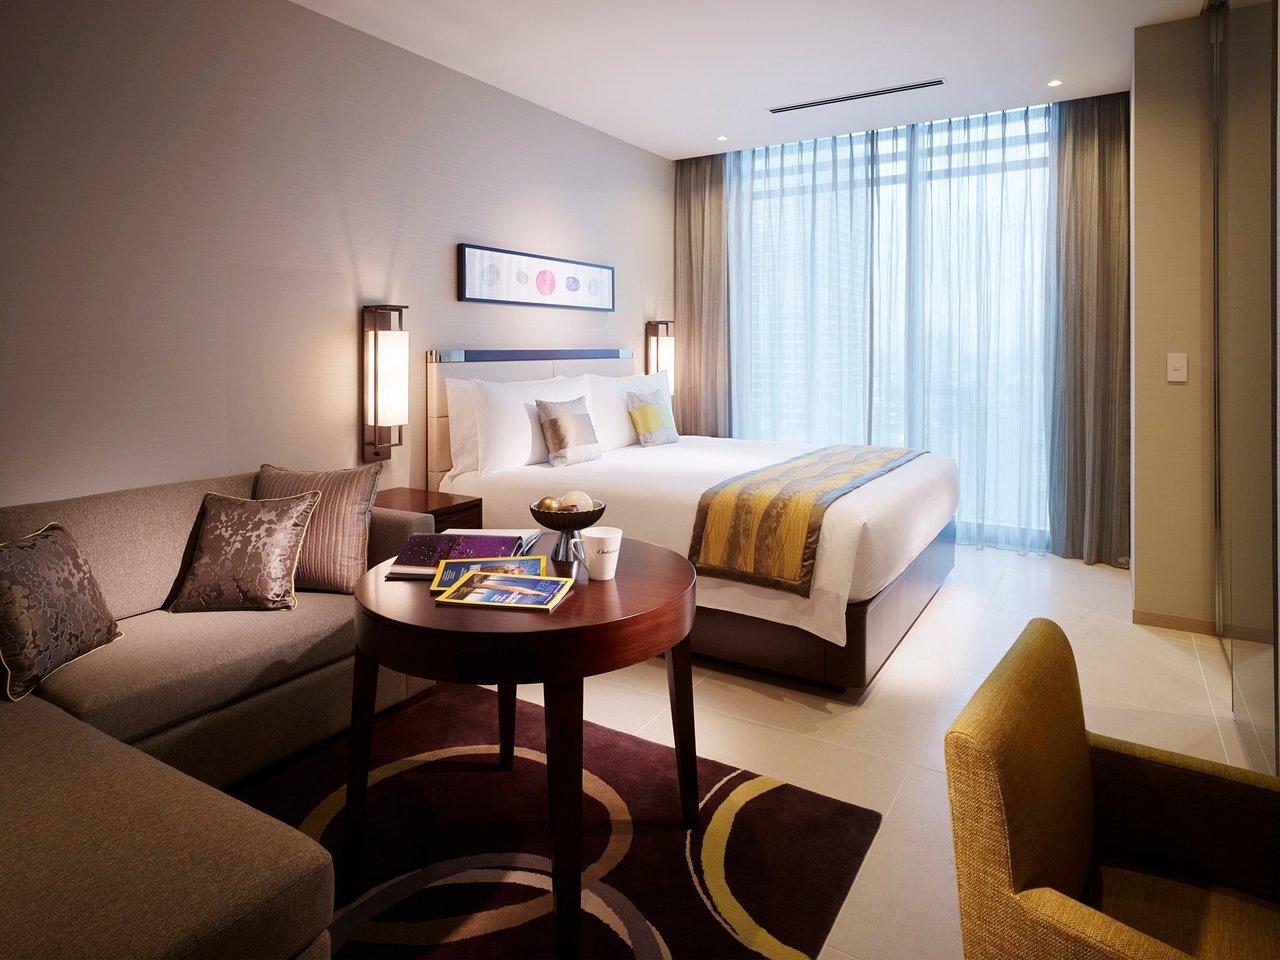 oakwood premier tokyo updated 2019 prices hotel reviews japan rh tripadvisor com